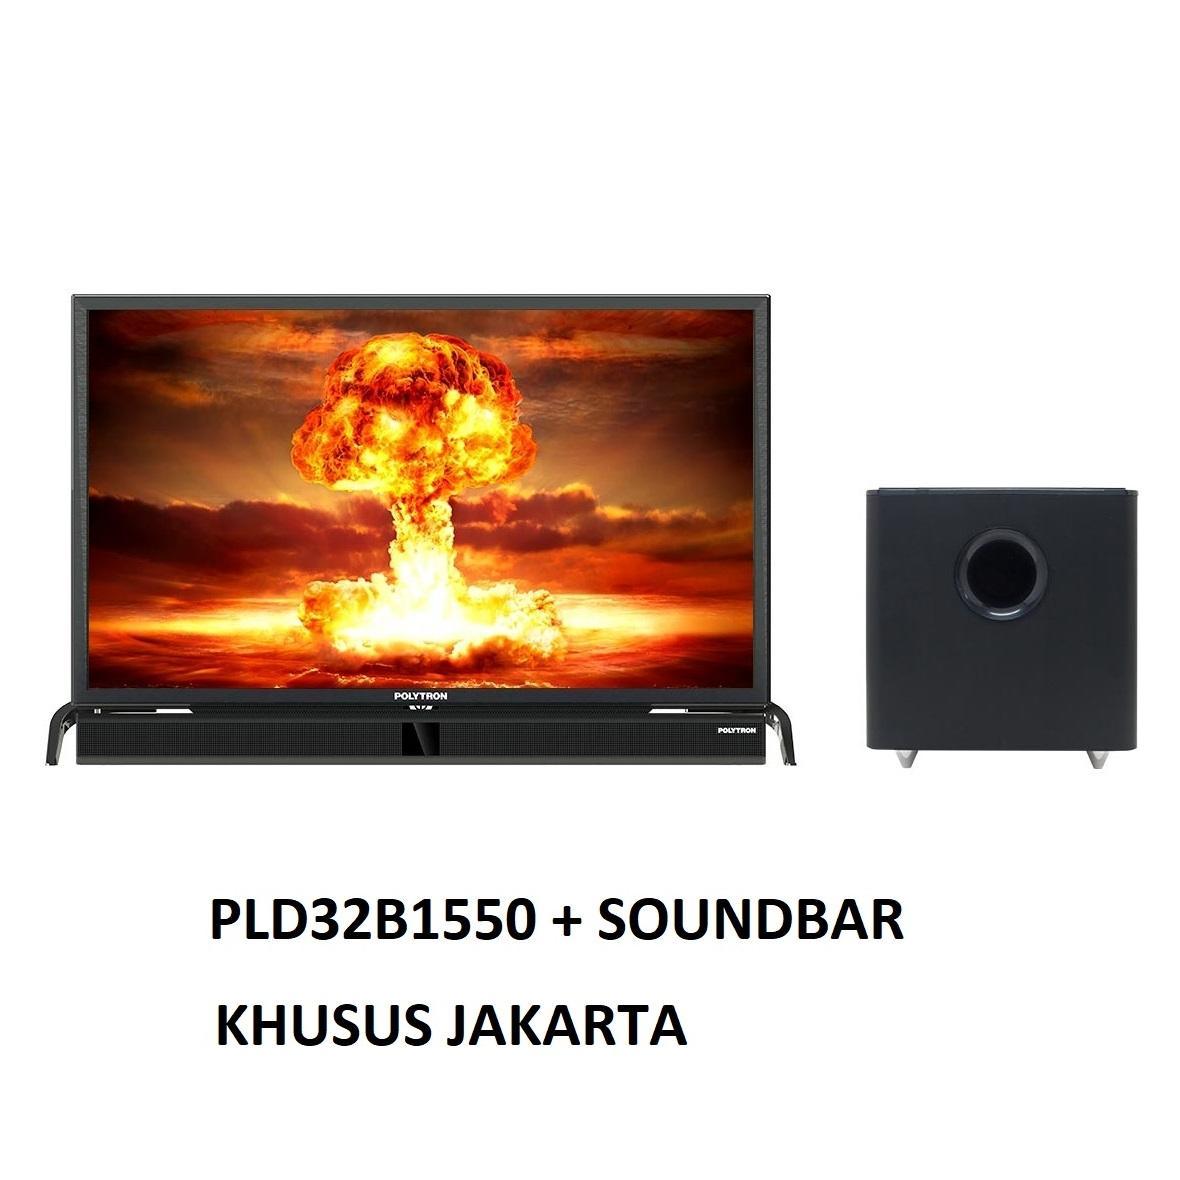 GRATIS ONGKIR - Polytron PLD32B1550 LED TV 32 Cinemax Soundbar- KHUSUS JAKARTA